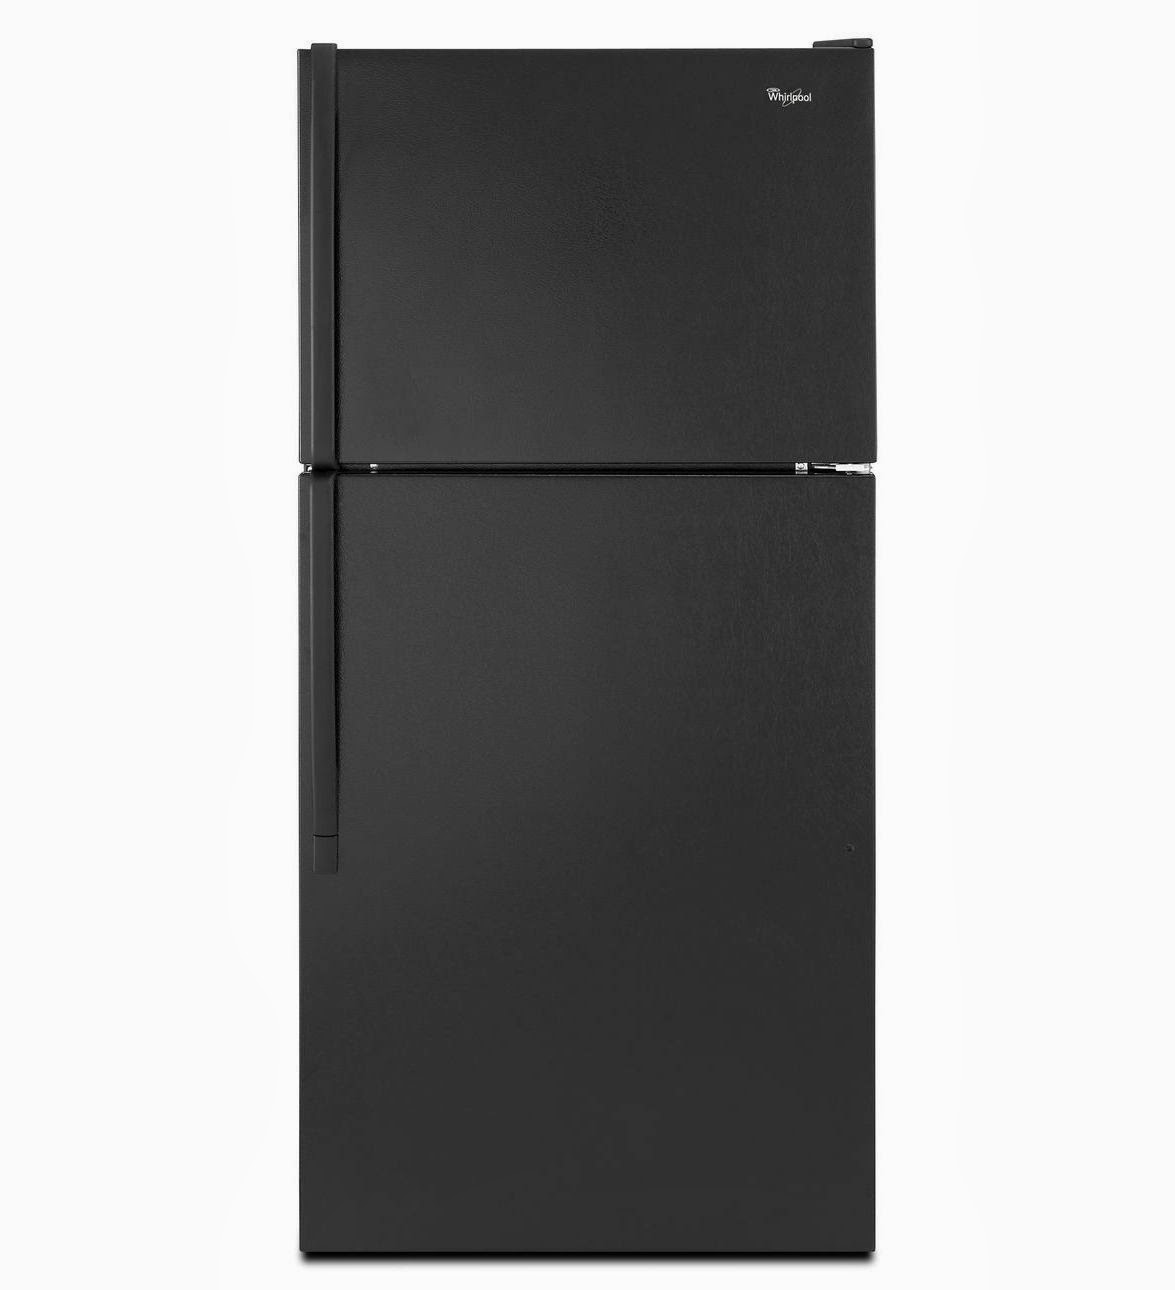 Whirlpool Refrigerator Brand Whirlpool Wl W8txewfyb